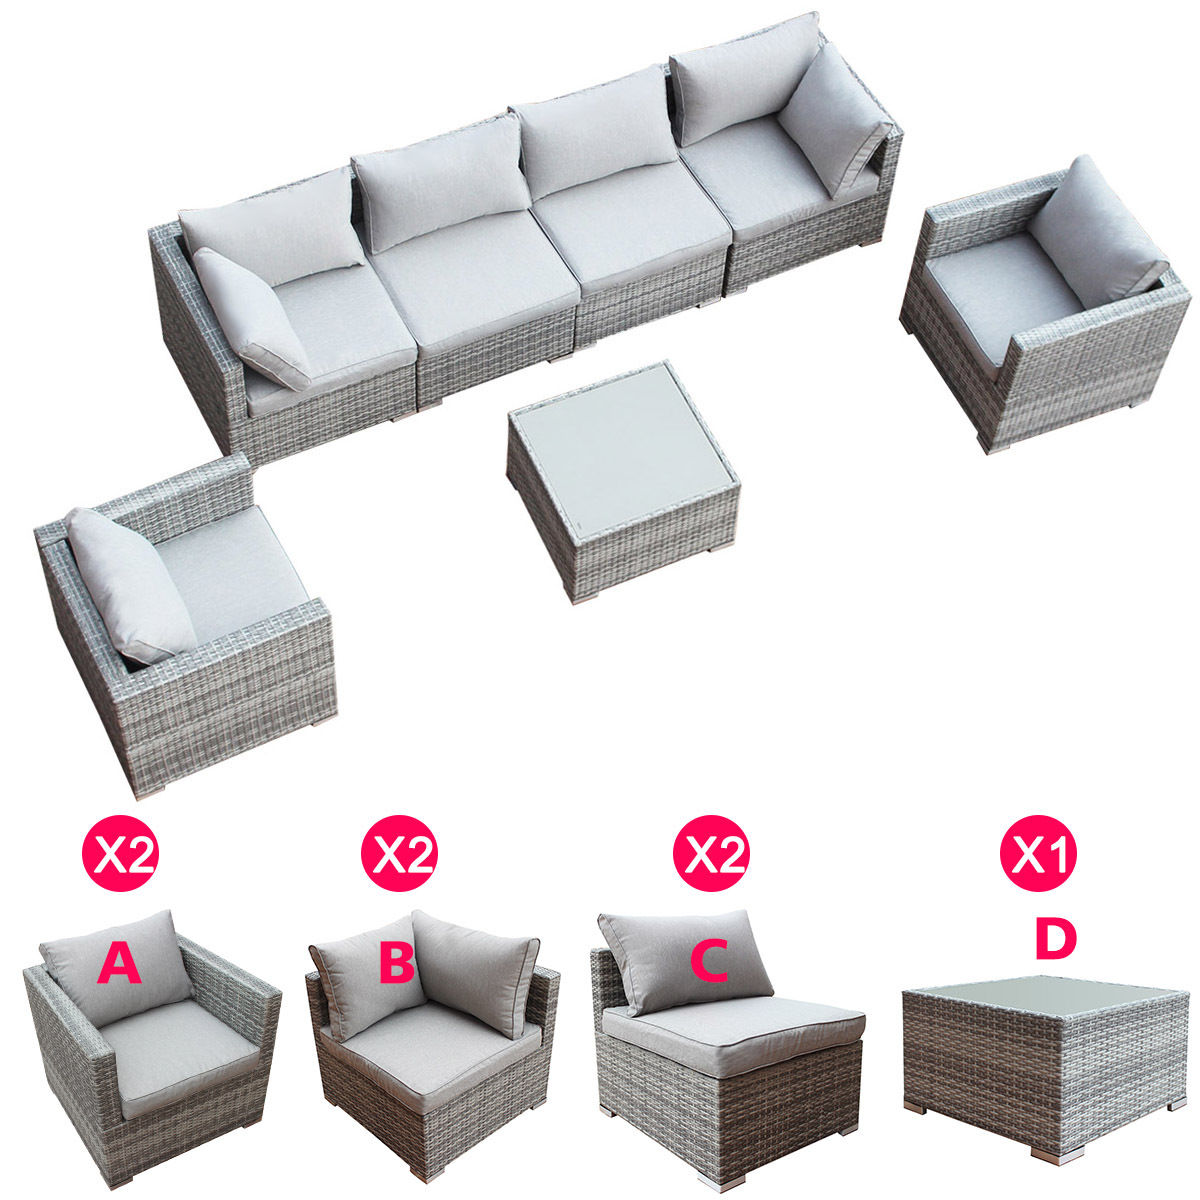 Costway 3-9PCS Patio Rattan Sofa Furniture Set Infinitely Combination PE Wicker Outdoor